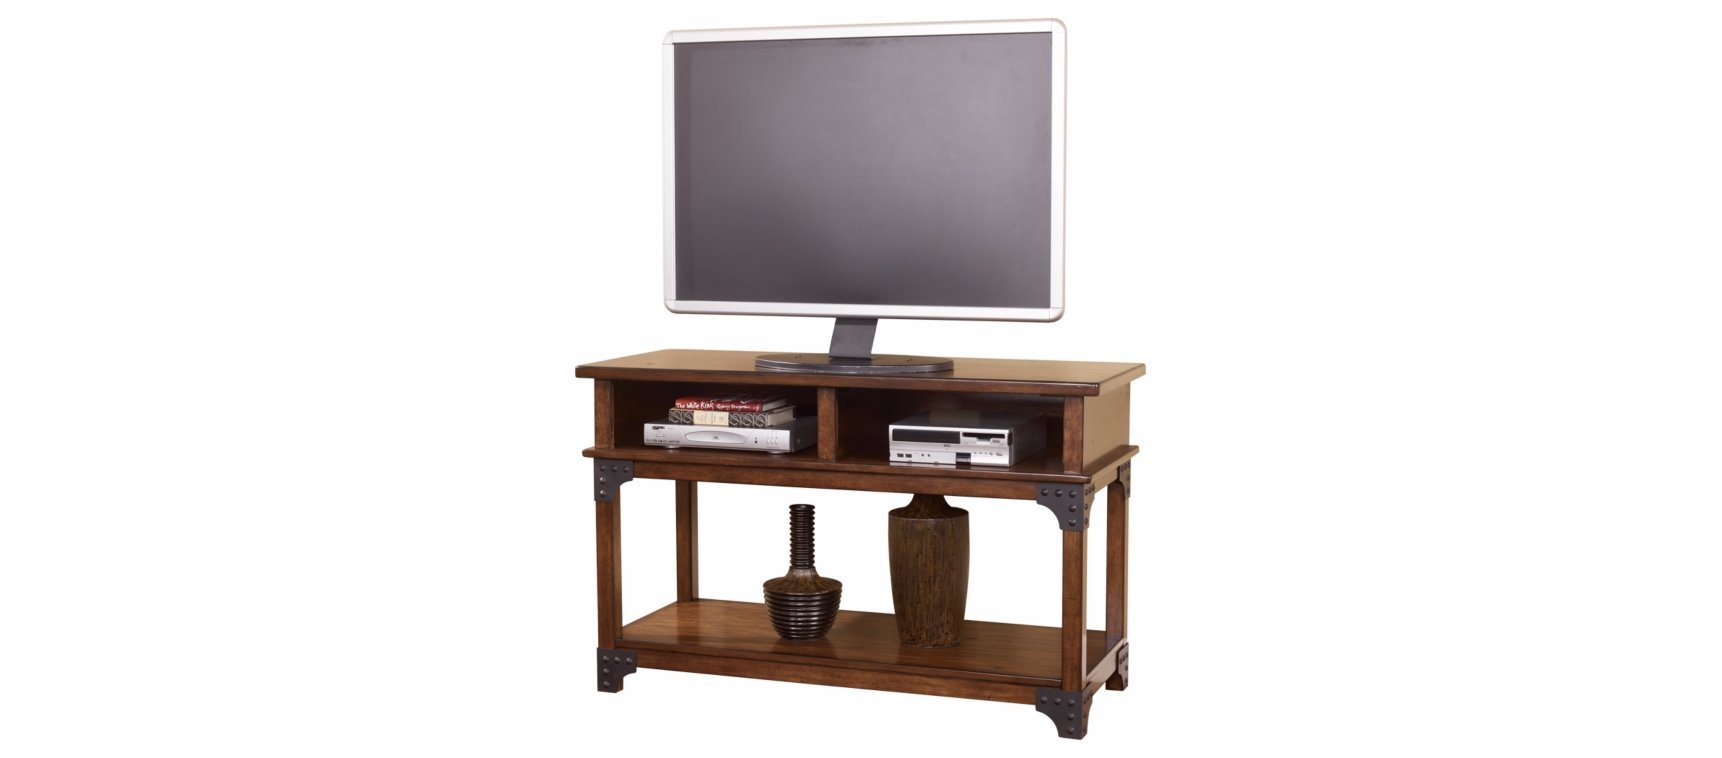 Ashley Furniture Signature Design - Murphy Sofa Table - Entertainment Console Table - Rustic Style - Rectangular - Medium Brown